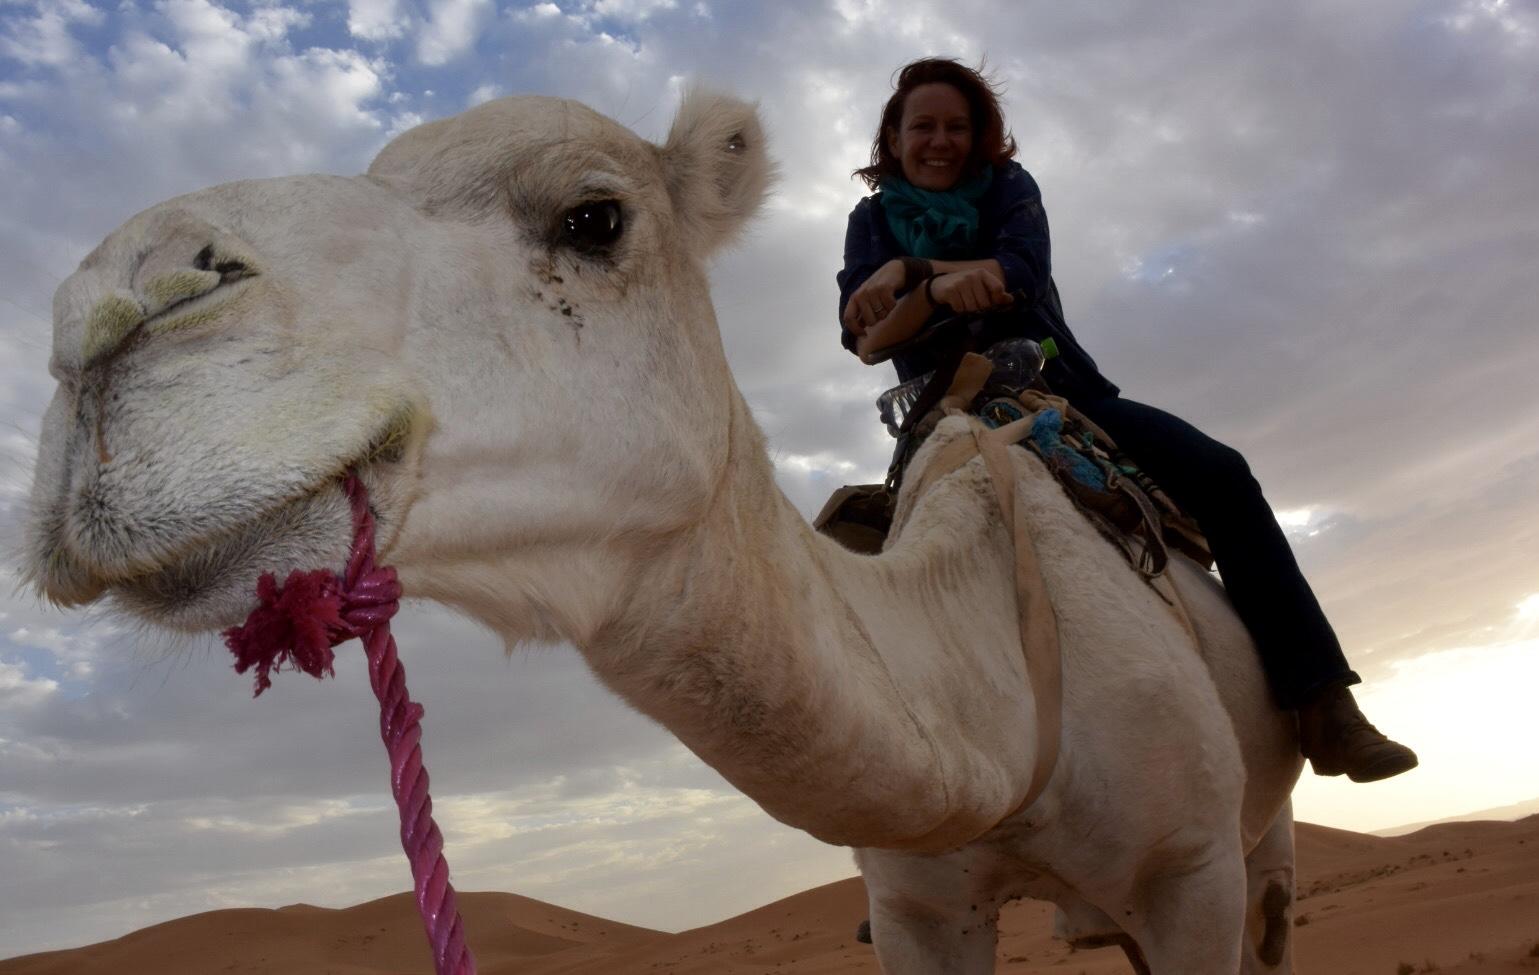 Ellen riding Romeo the camel, Morocco August 2017